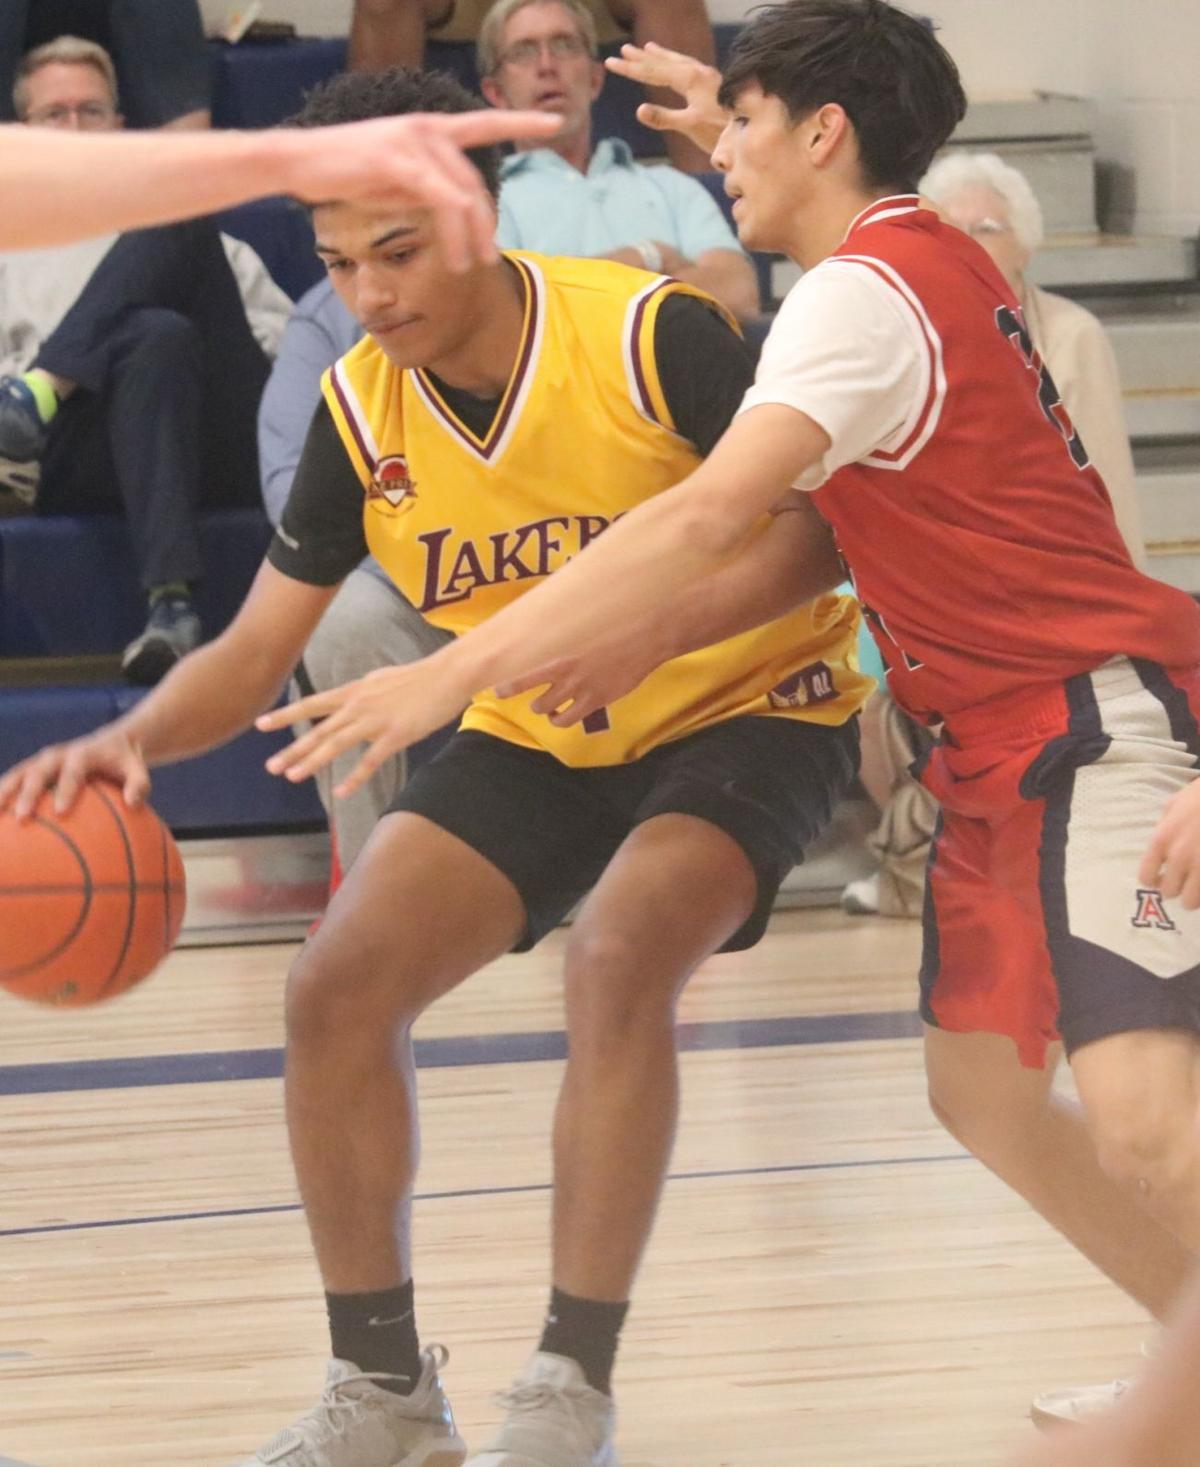 AZ Prep Basketball Academy